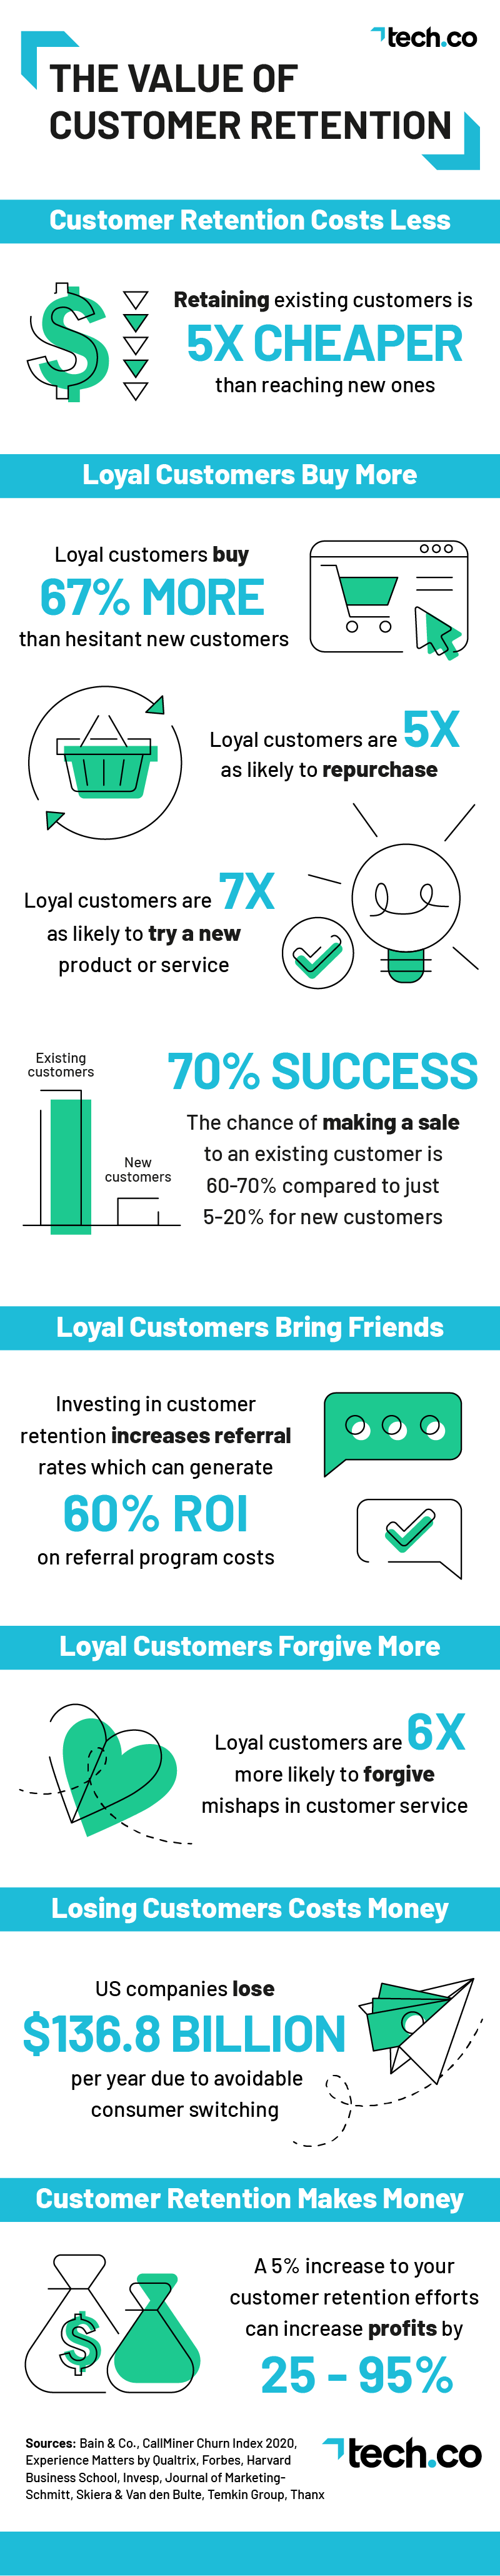 The Value of Customer Retention